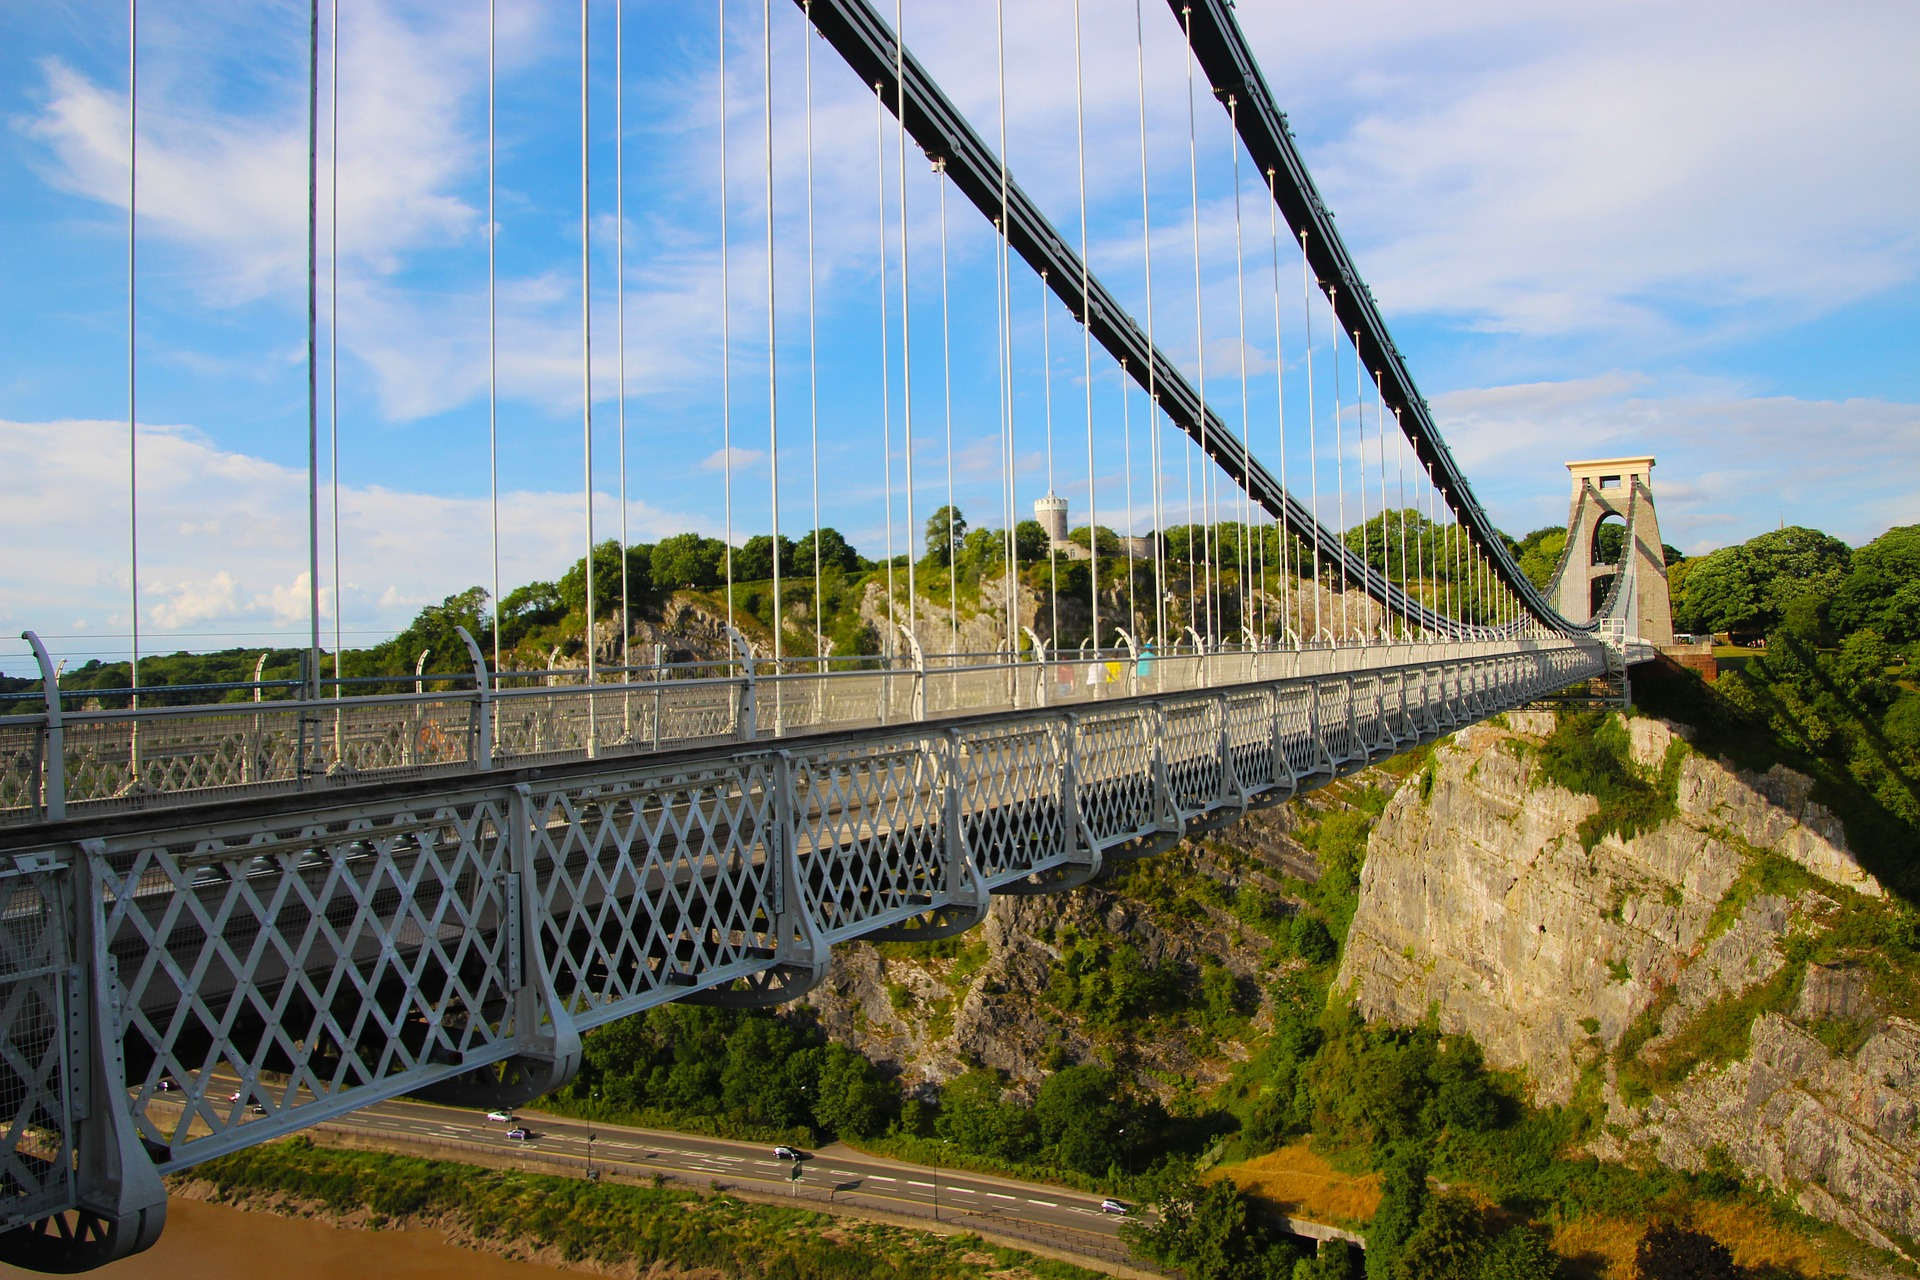 Clifton Suspension Bridge in Daytime